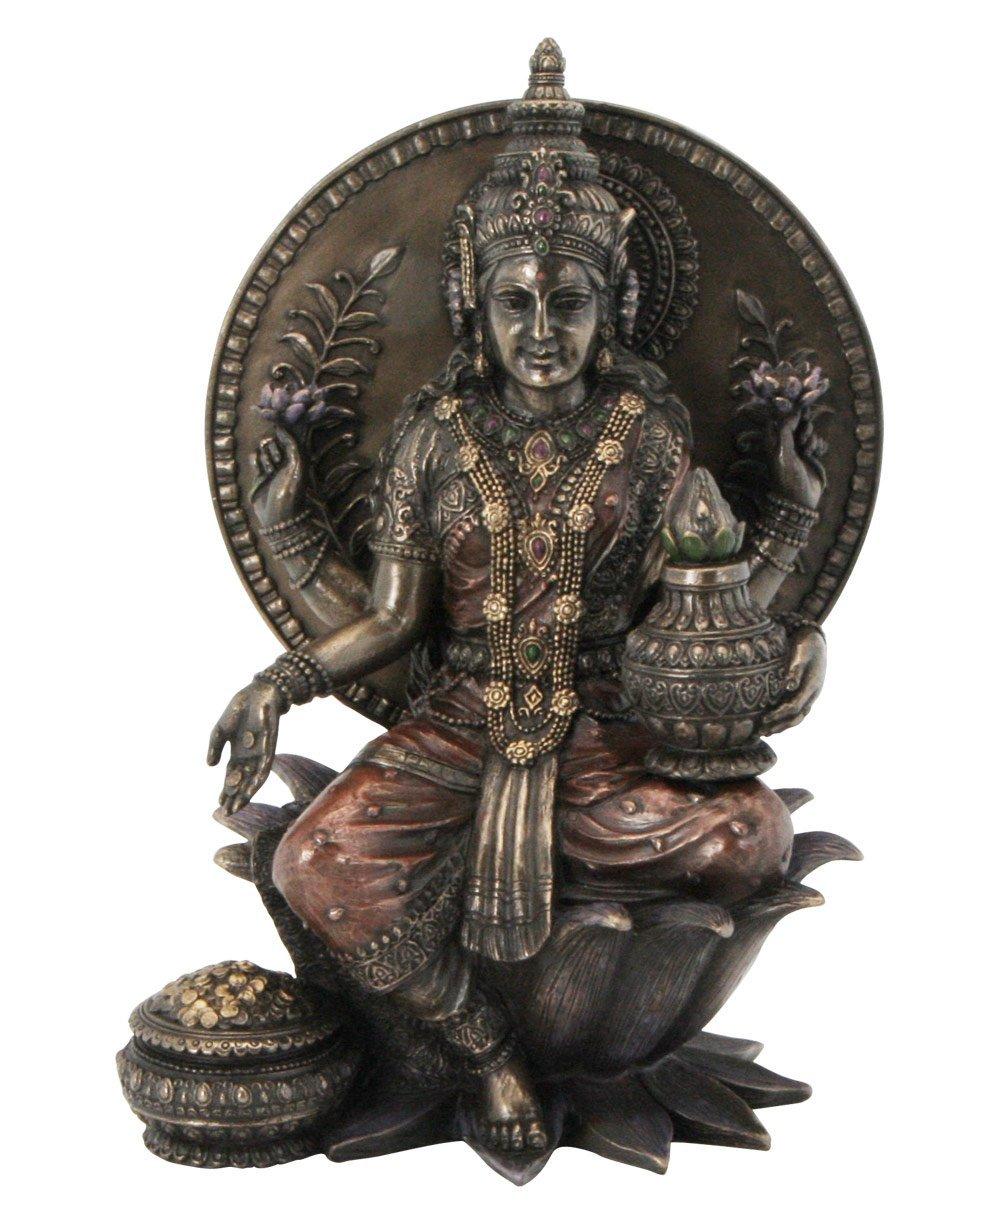 Hindu gods statues car interior design - God and goddess statues ...